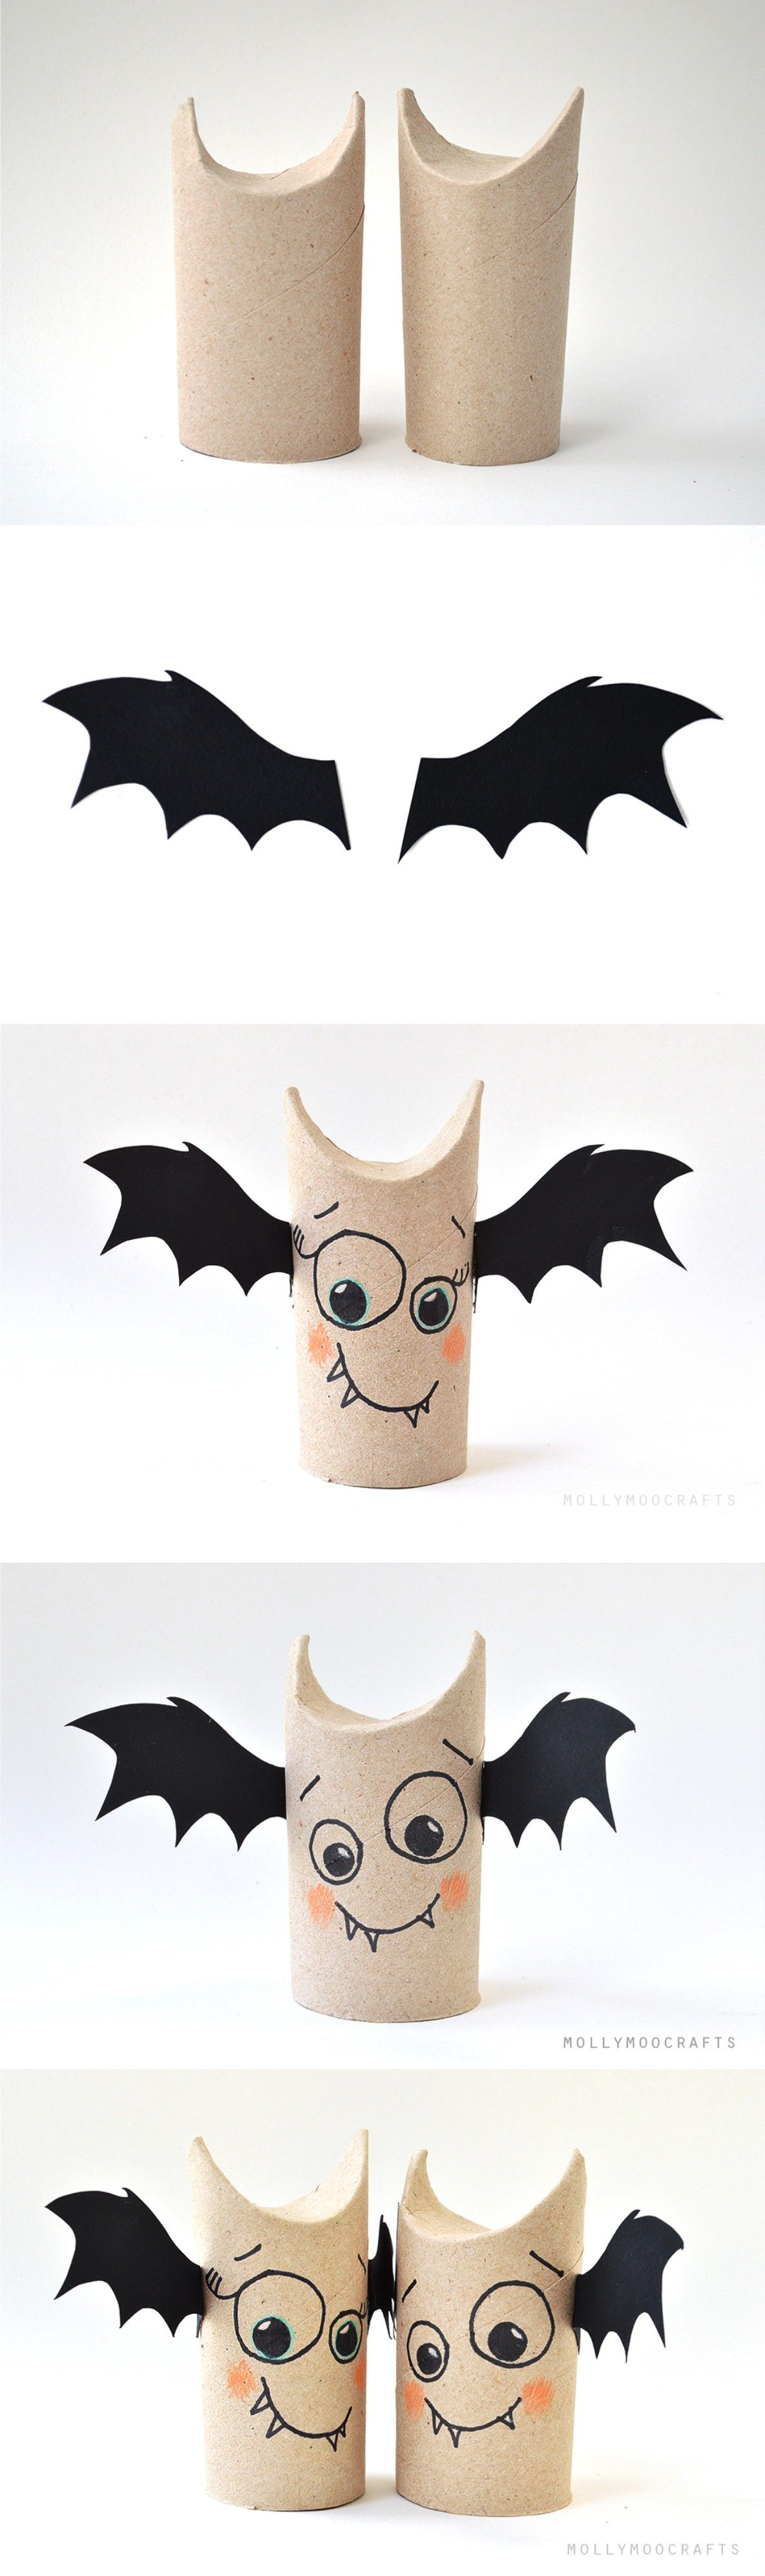 Decoraci n simple de halloween craft halloween ideas - Adornos de halloween ...